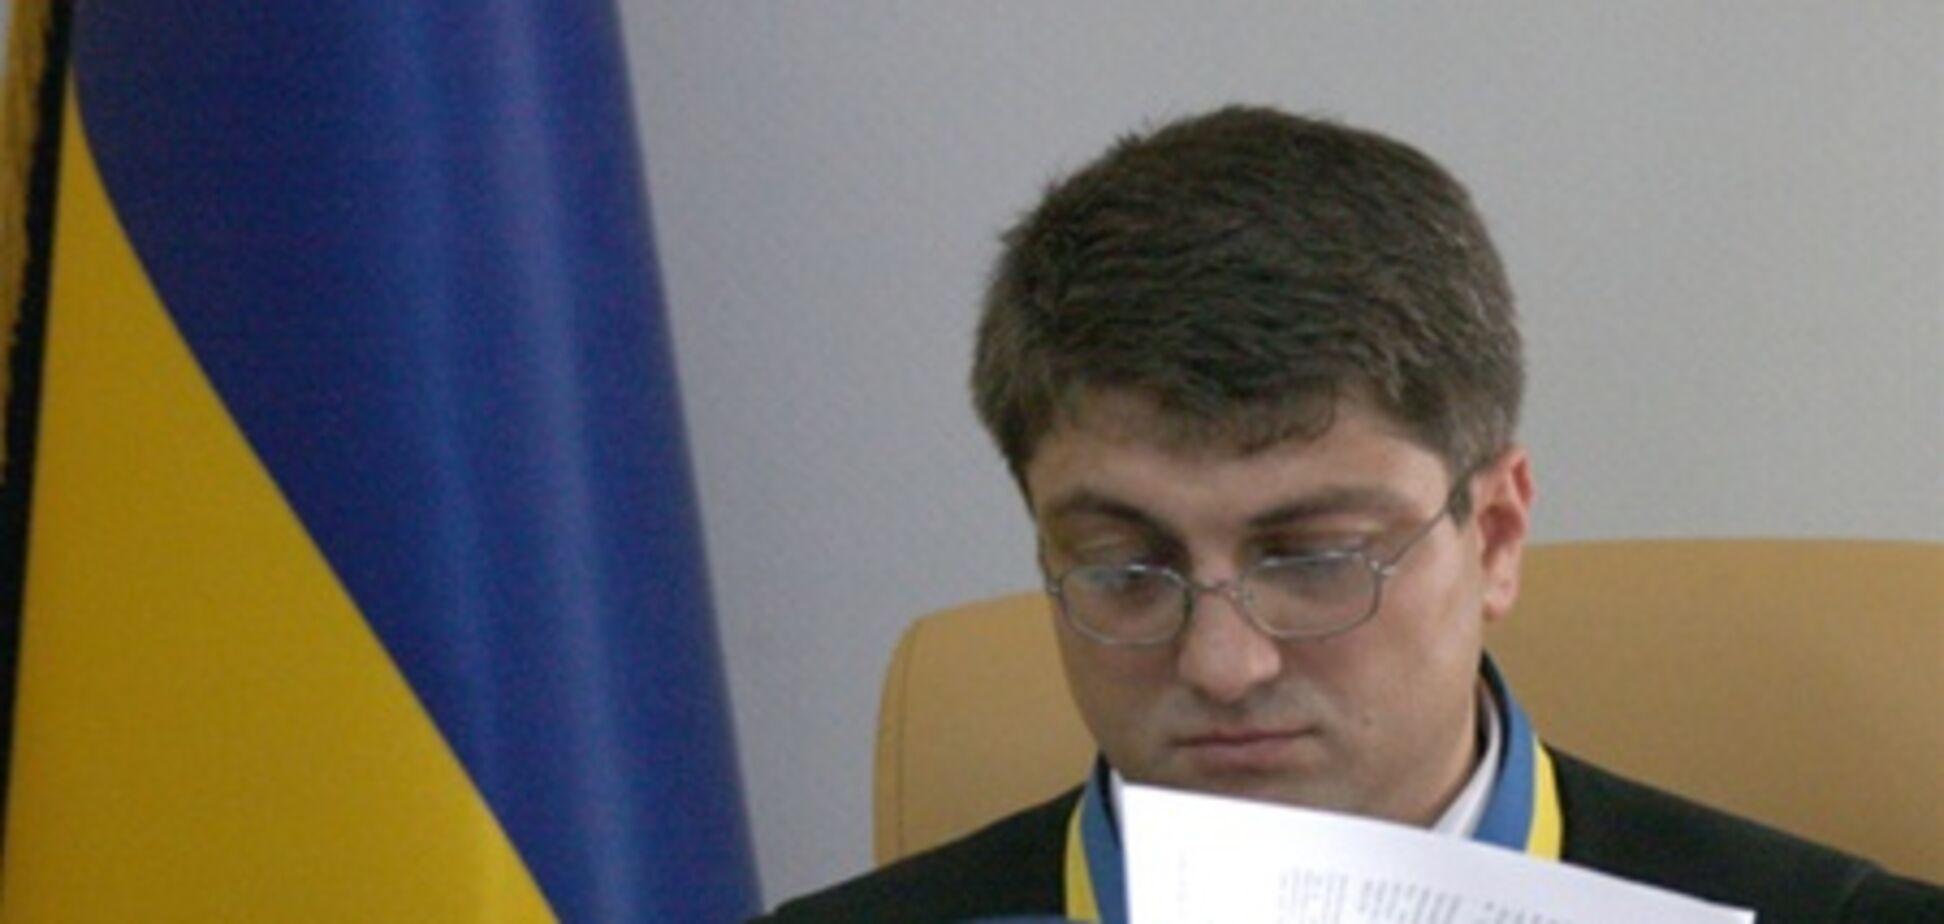 Тимошенко снова оставили без адвокатов